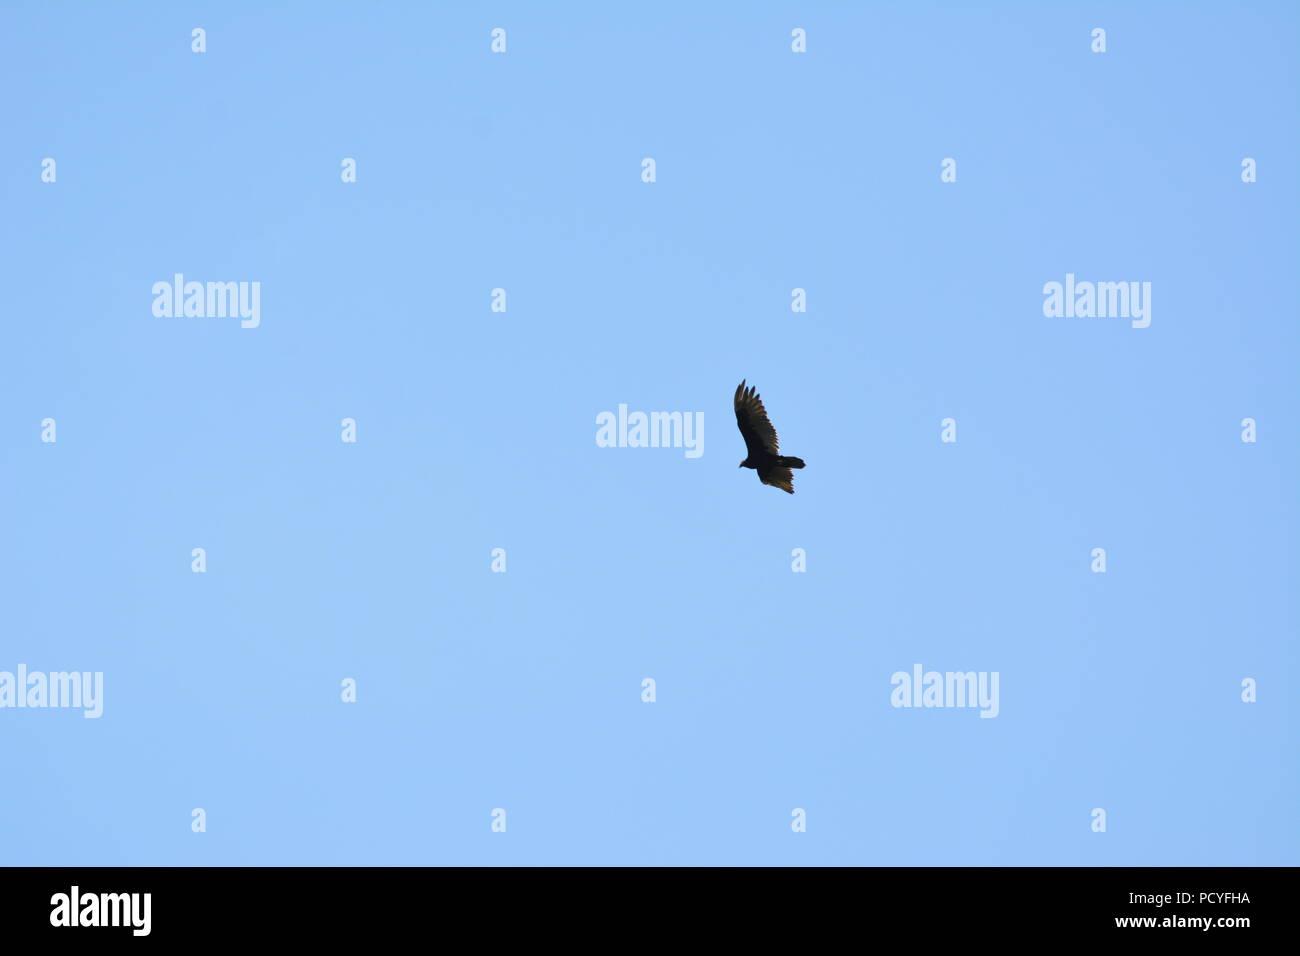 Bird soaring below blue sky - Stock Image